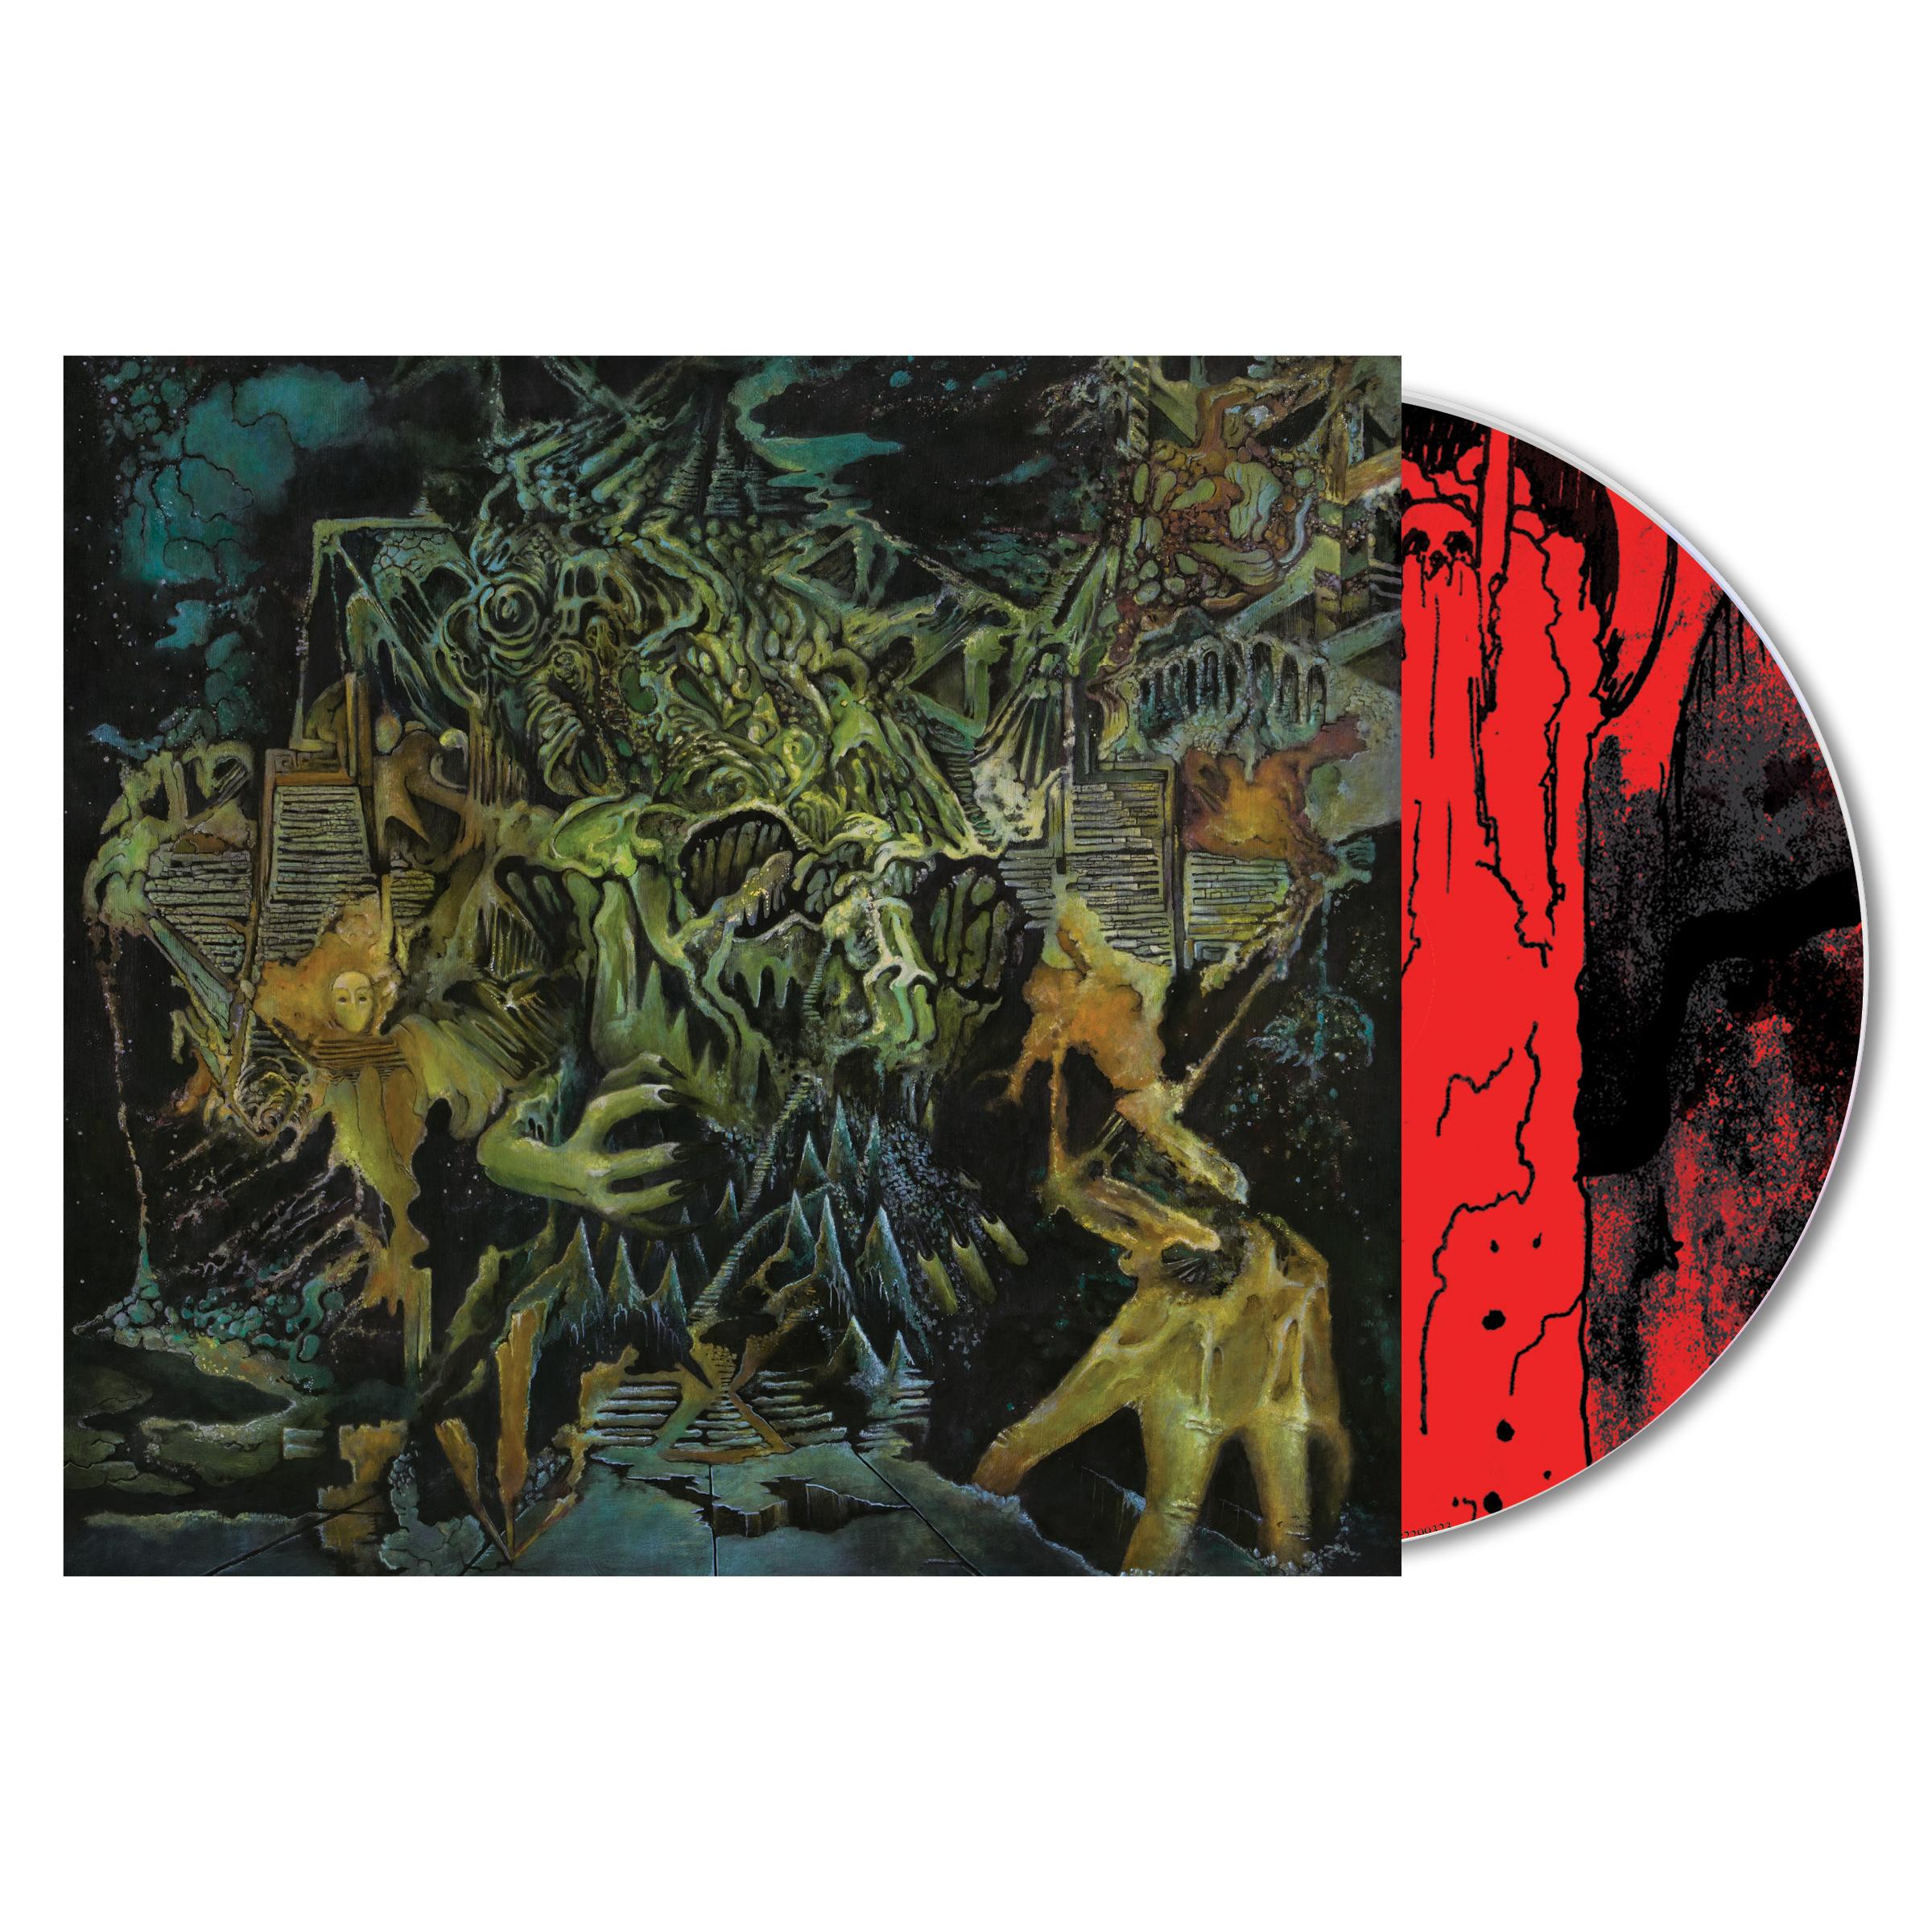 King Gizzard & the Lizard Wizard - Murder of the Universe CD